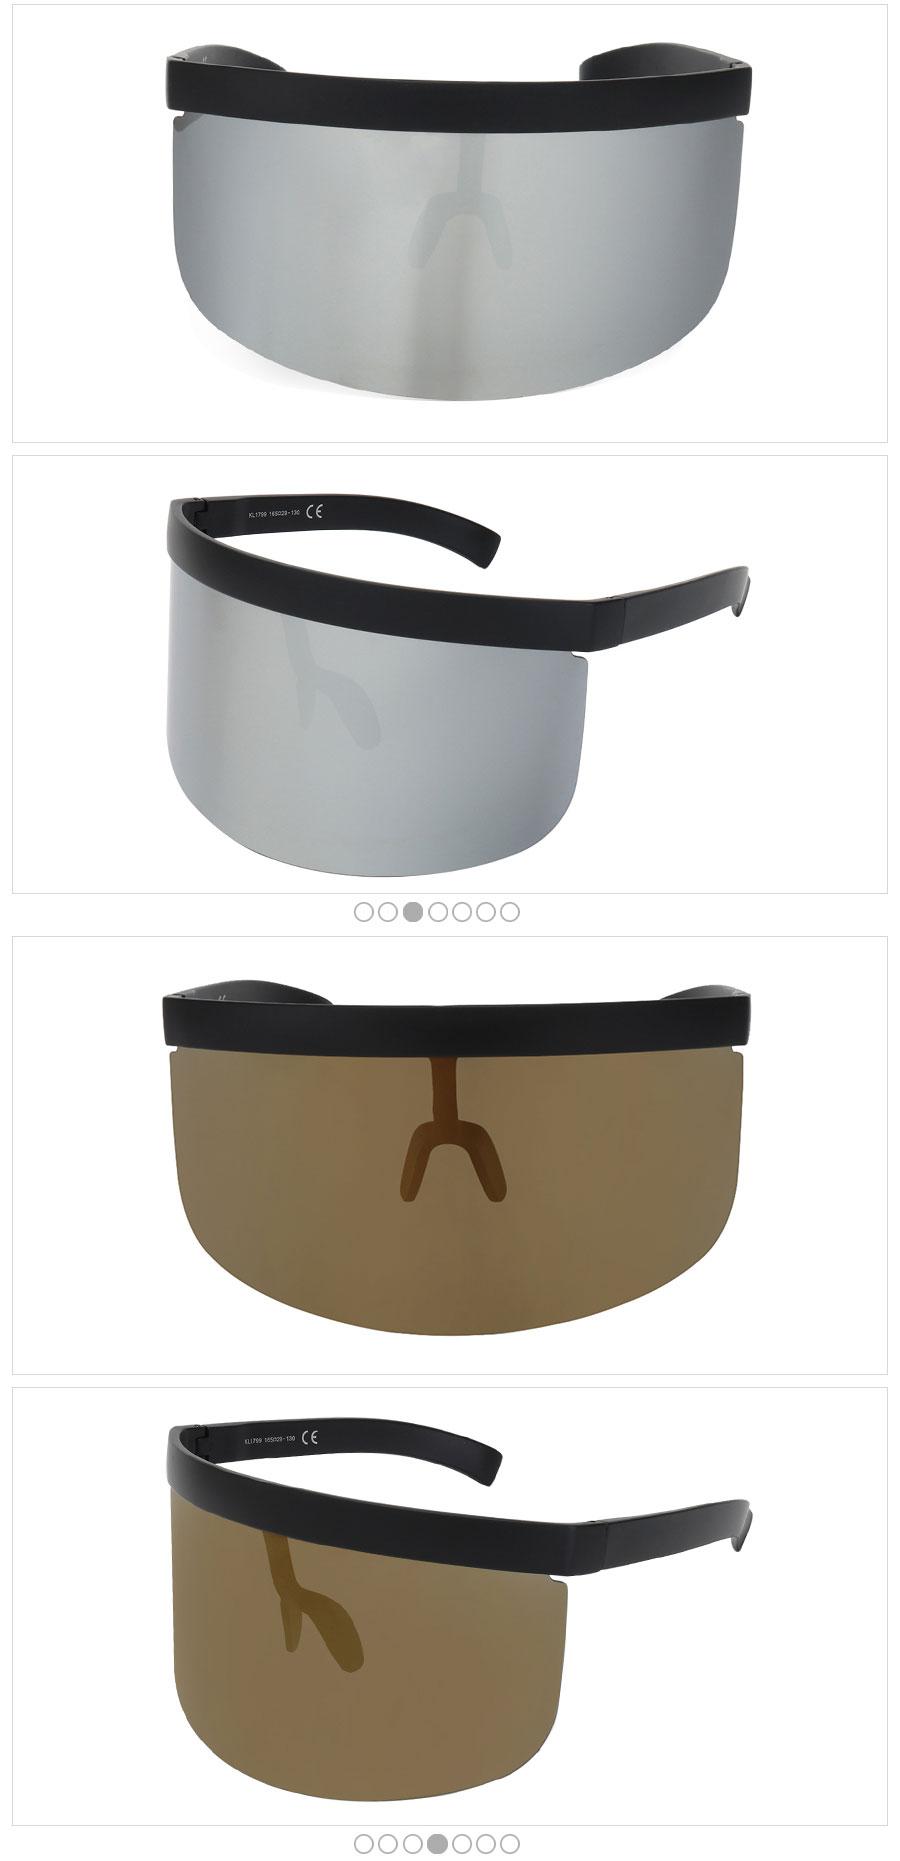 94db7234a12 Vintage Extra Oversize Shield Visor Sunglasses Women Flat Top Mask Mirrored  Shades Men Windproof Eyewear UV400